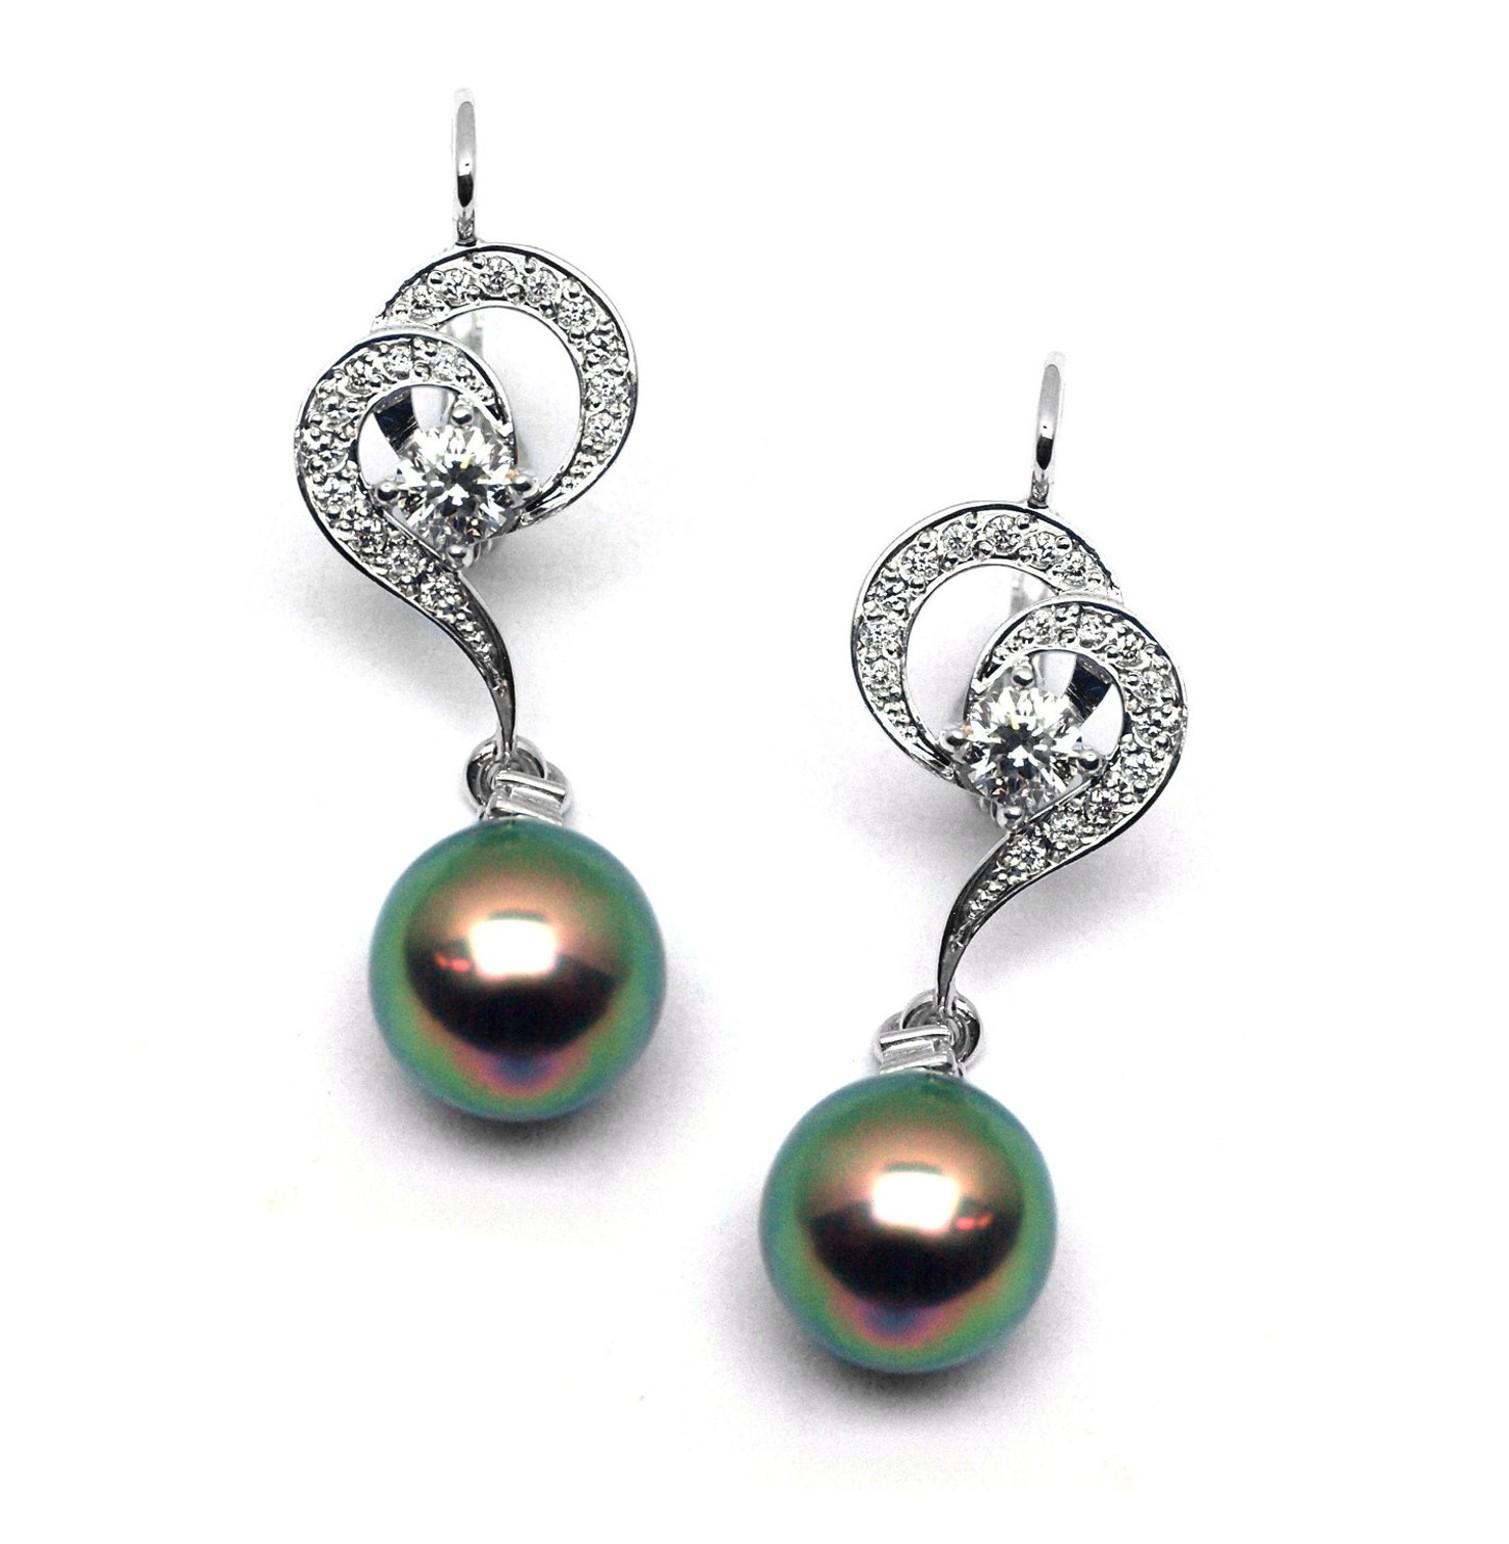 Diamantové zlaté náušnice Náušnice s tahitskými perlami a diamanty J-28334-17 (J-28334-17 - POŠTOVNÉ ZDARMA!!)